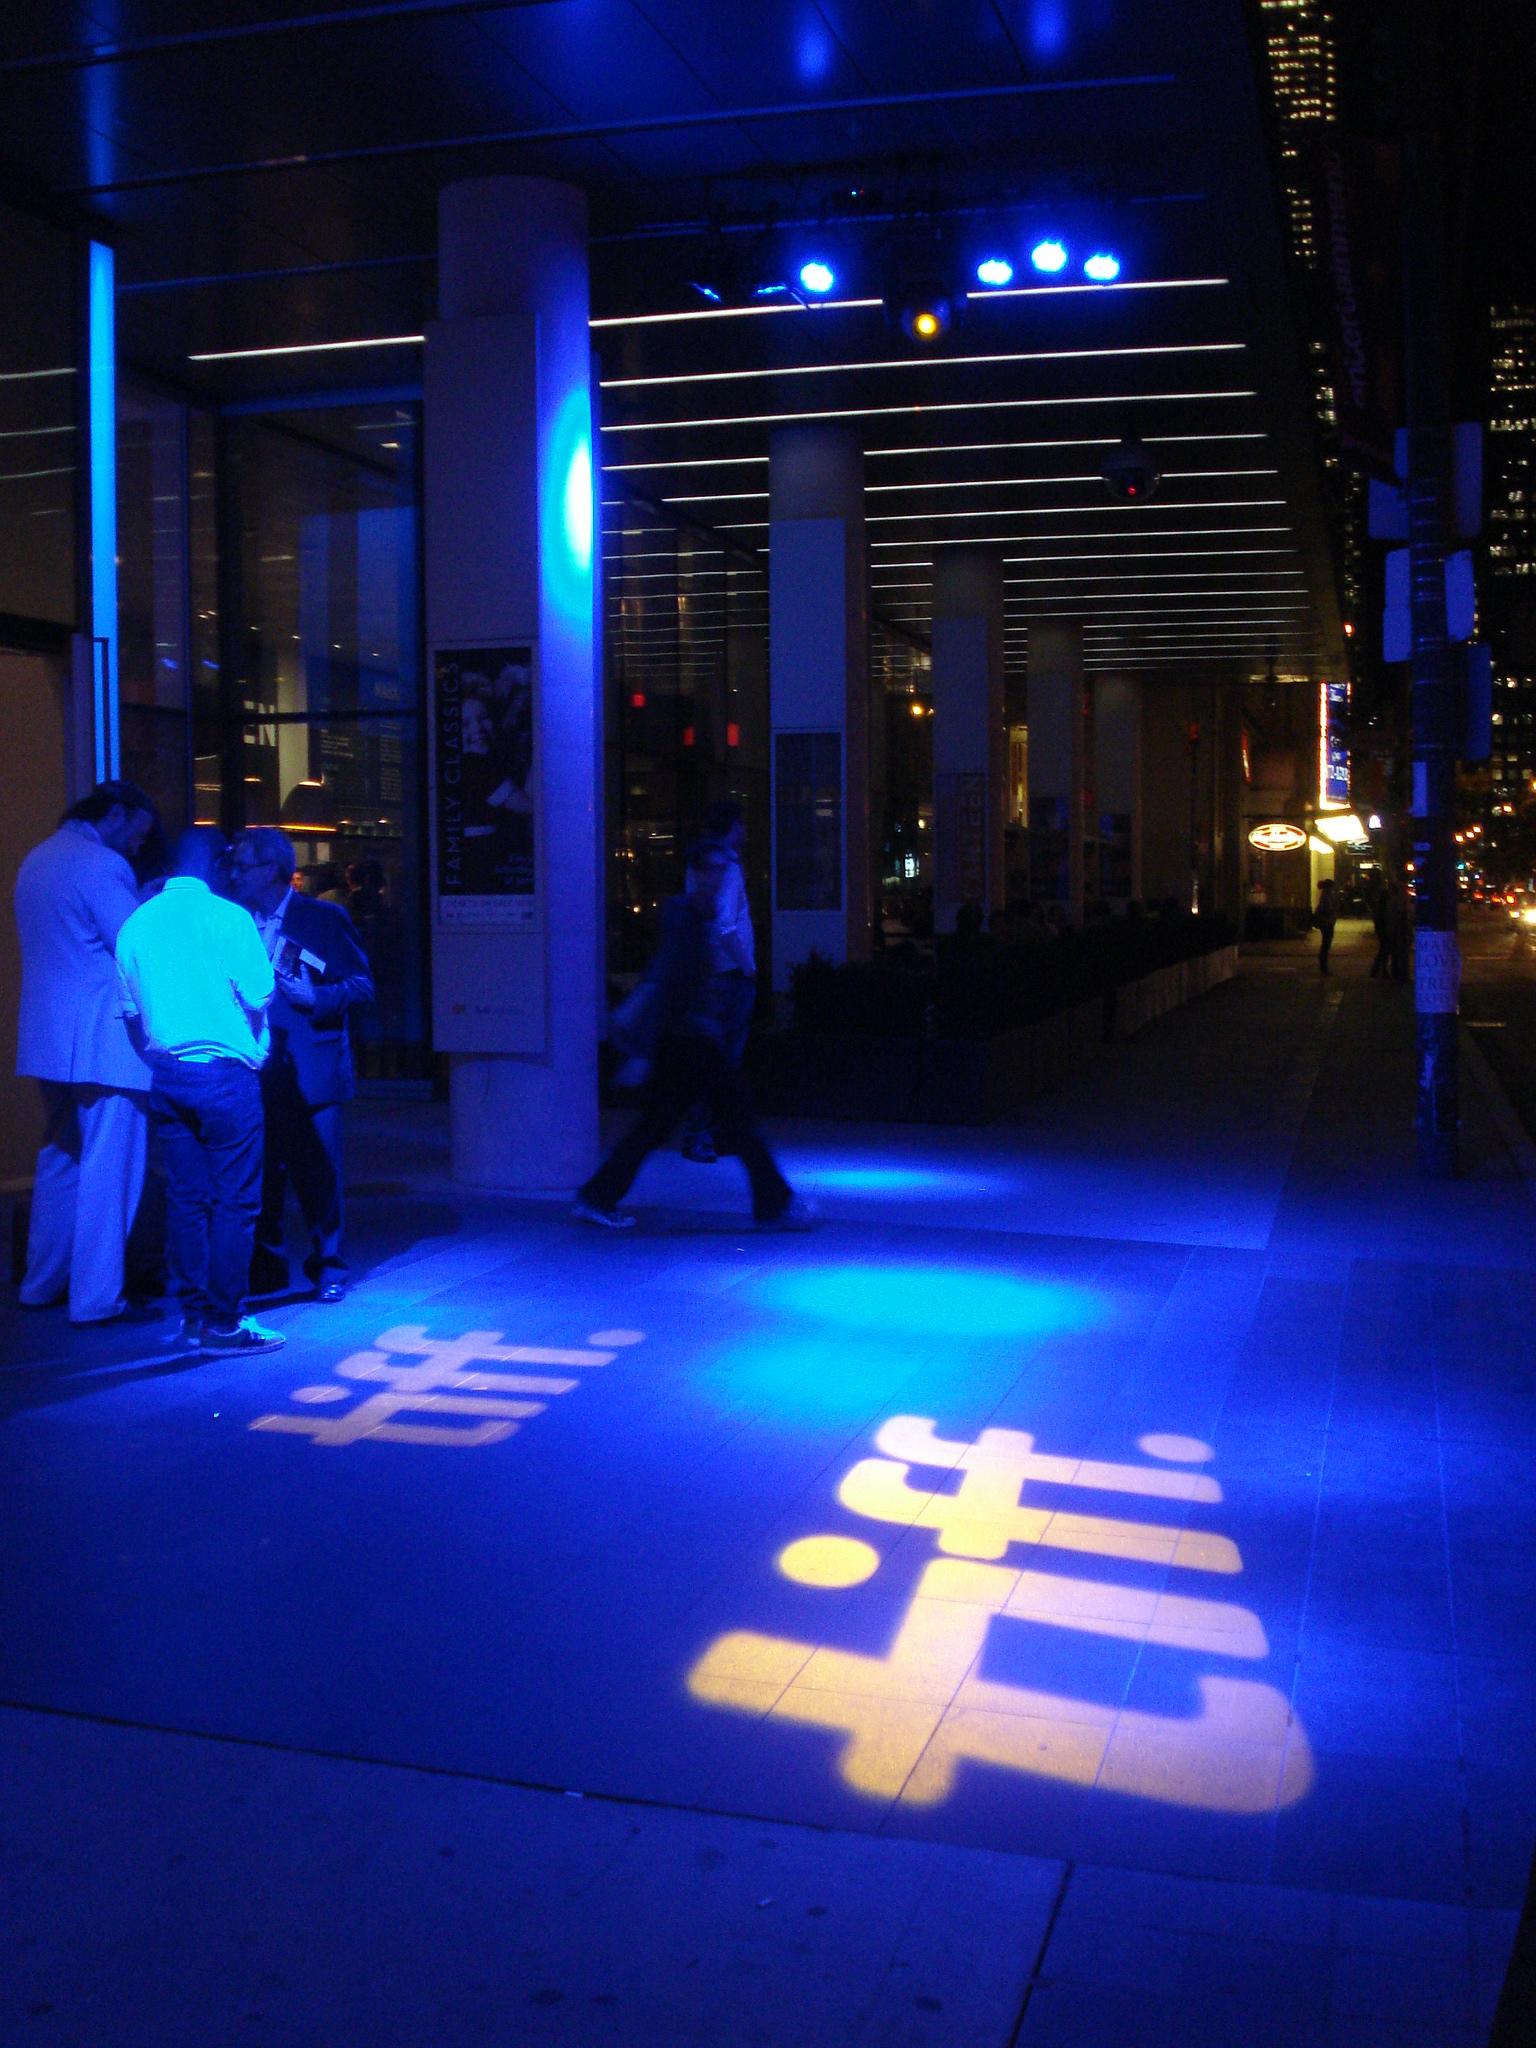 Toronto International Film Festival (TIFF) is one of the premiere film festivals in the world